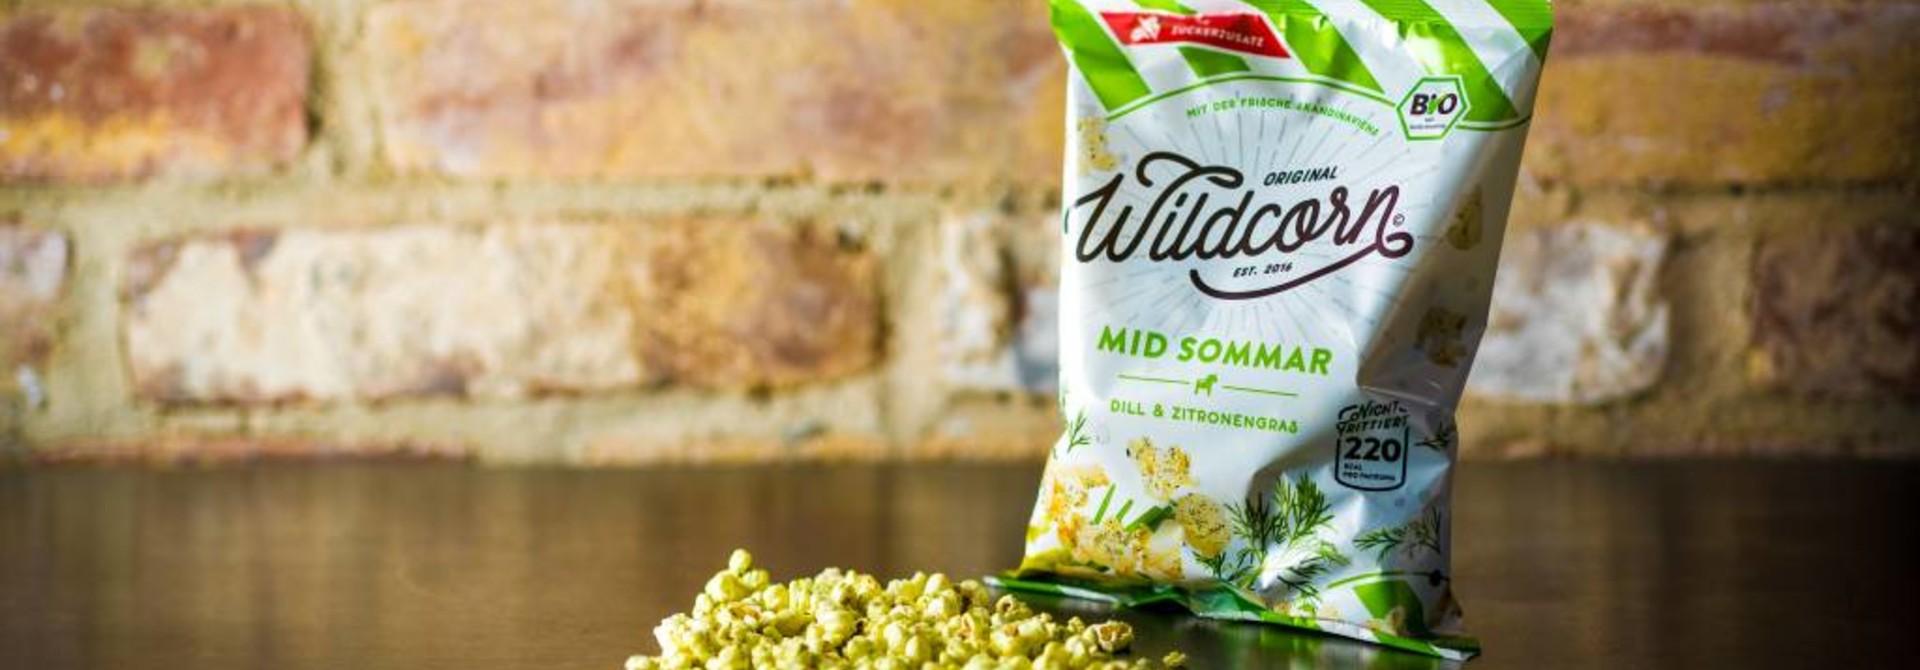 Wildcorn Mid Somar Bio